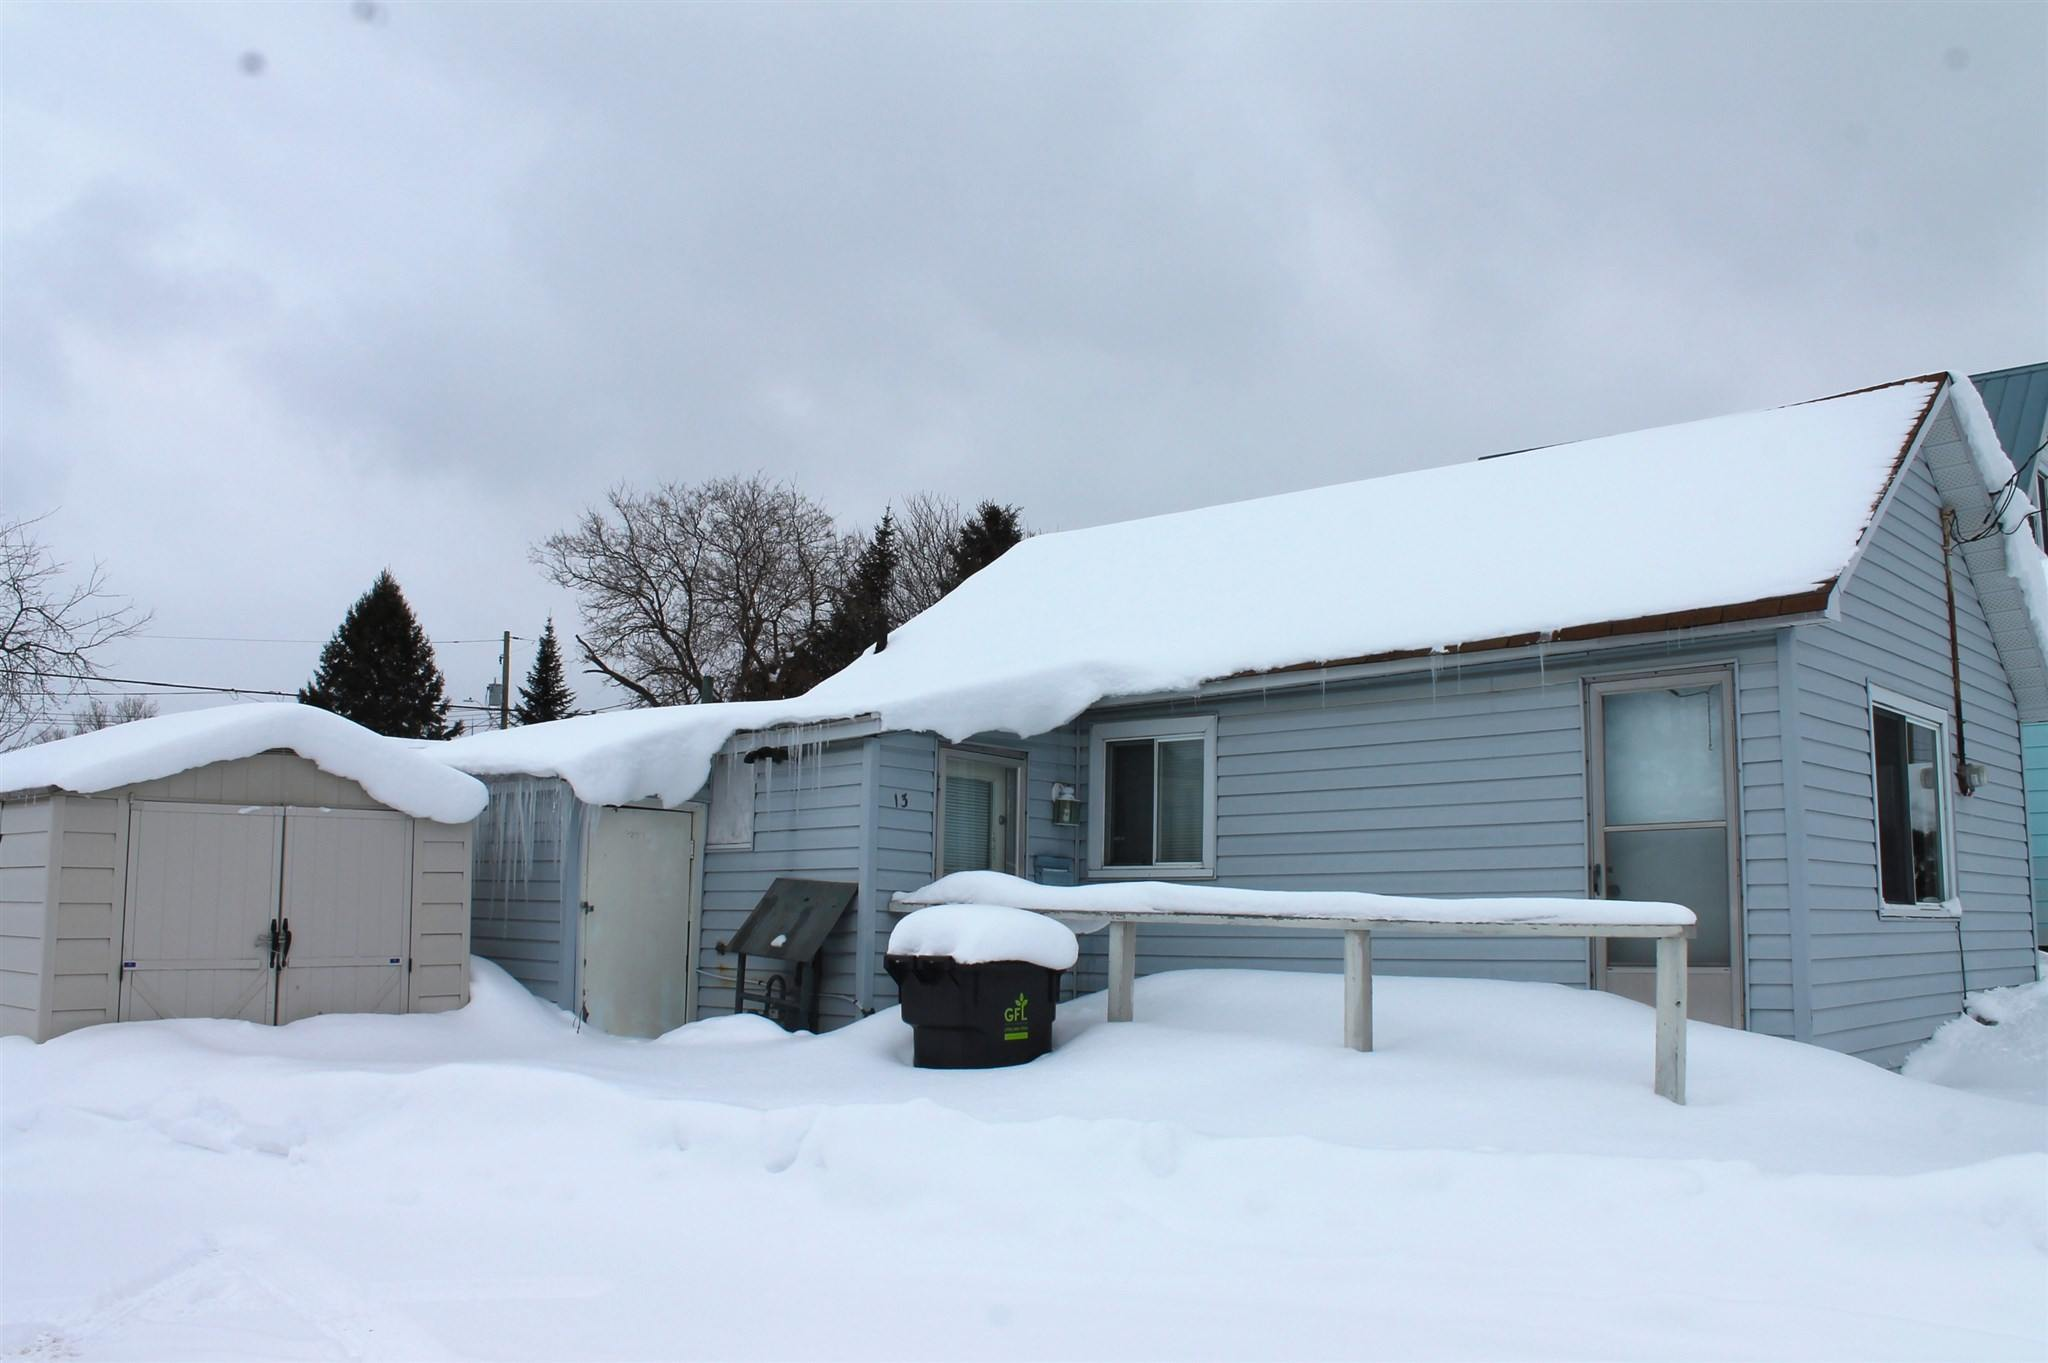 13 Blake Avenue, Sault Ste. Marie, ON (Kristen Trembinski/Exit Realty Lake Superior)